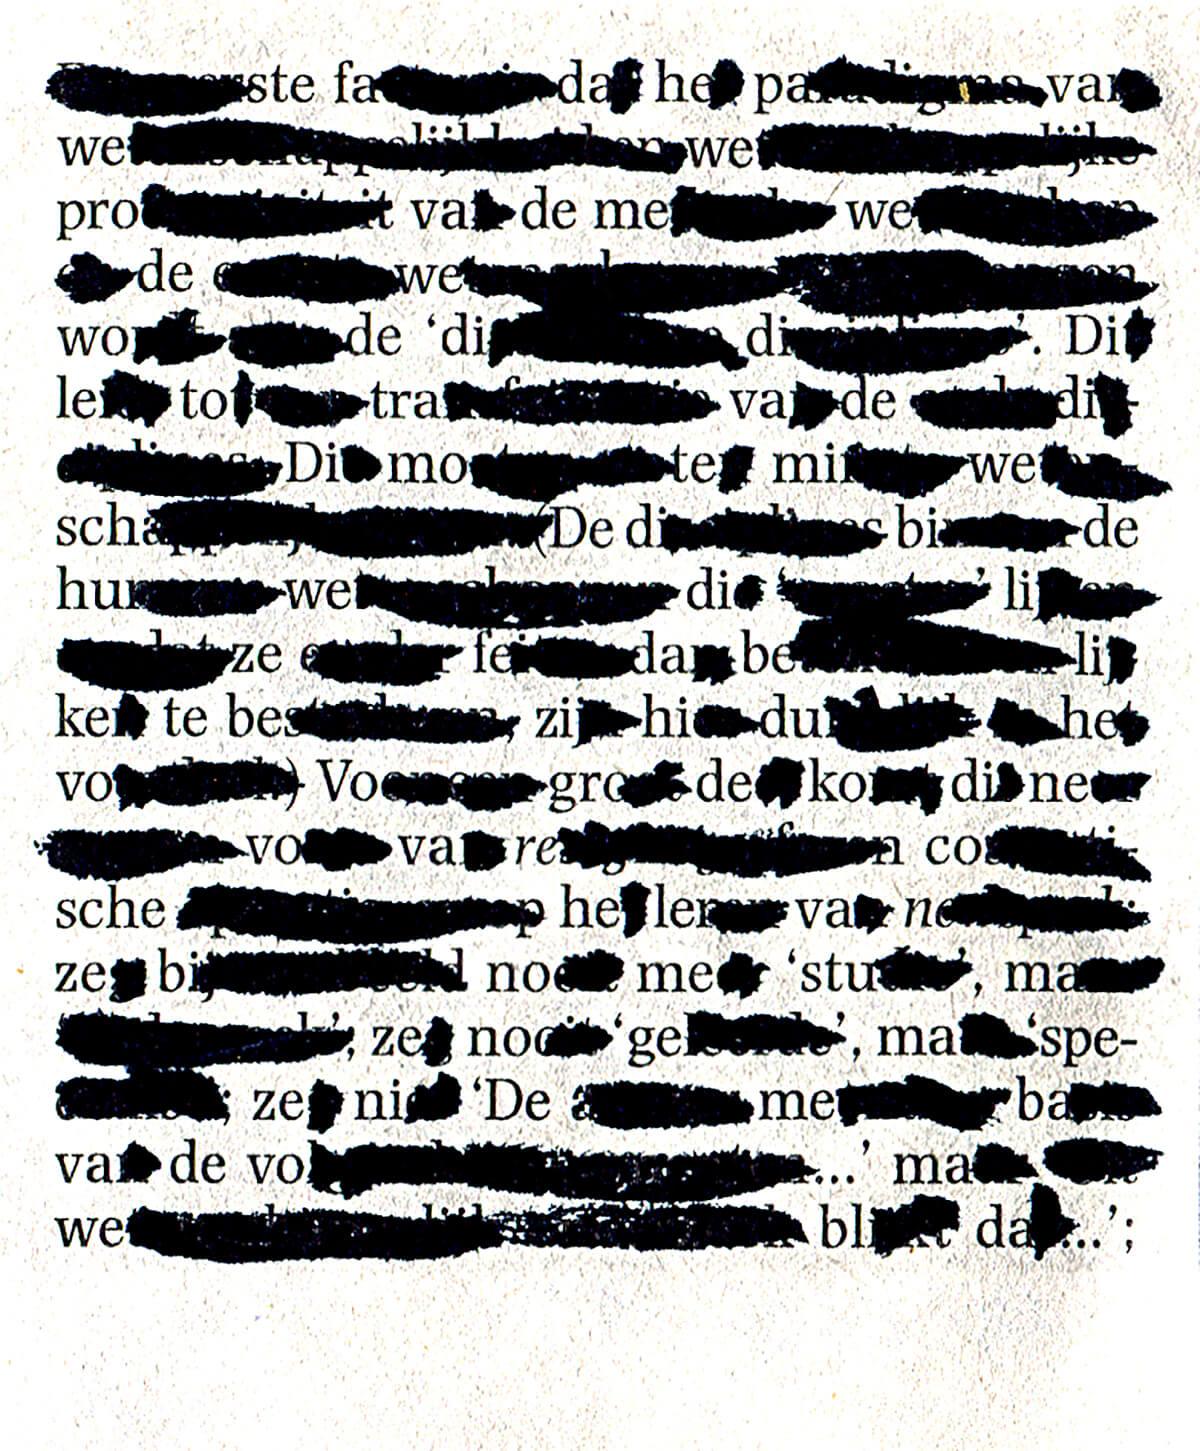 Ste-fa-da, 8 x 6,8 cm, ink on newspaper, 2016